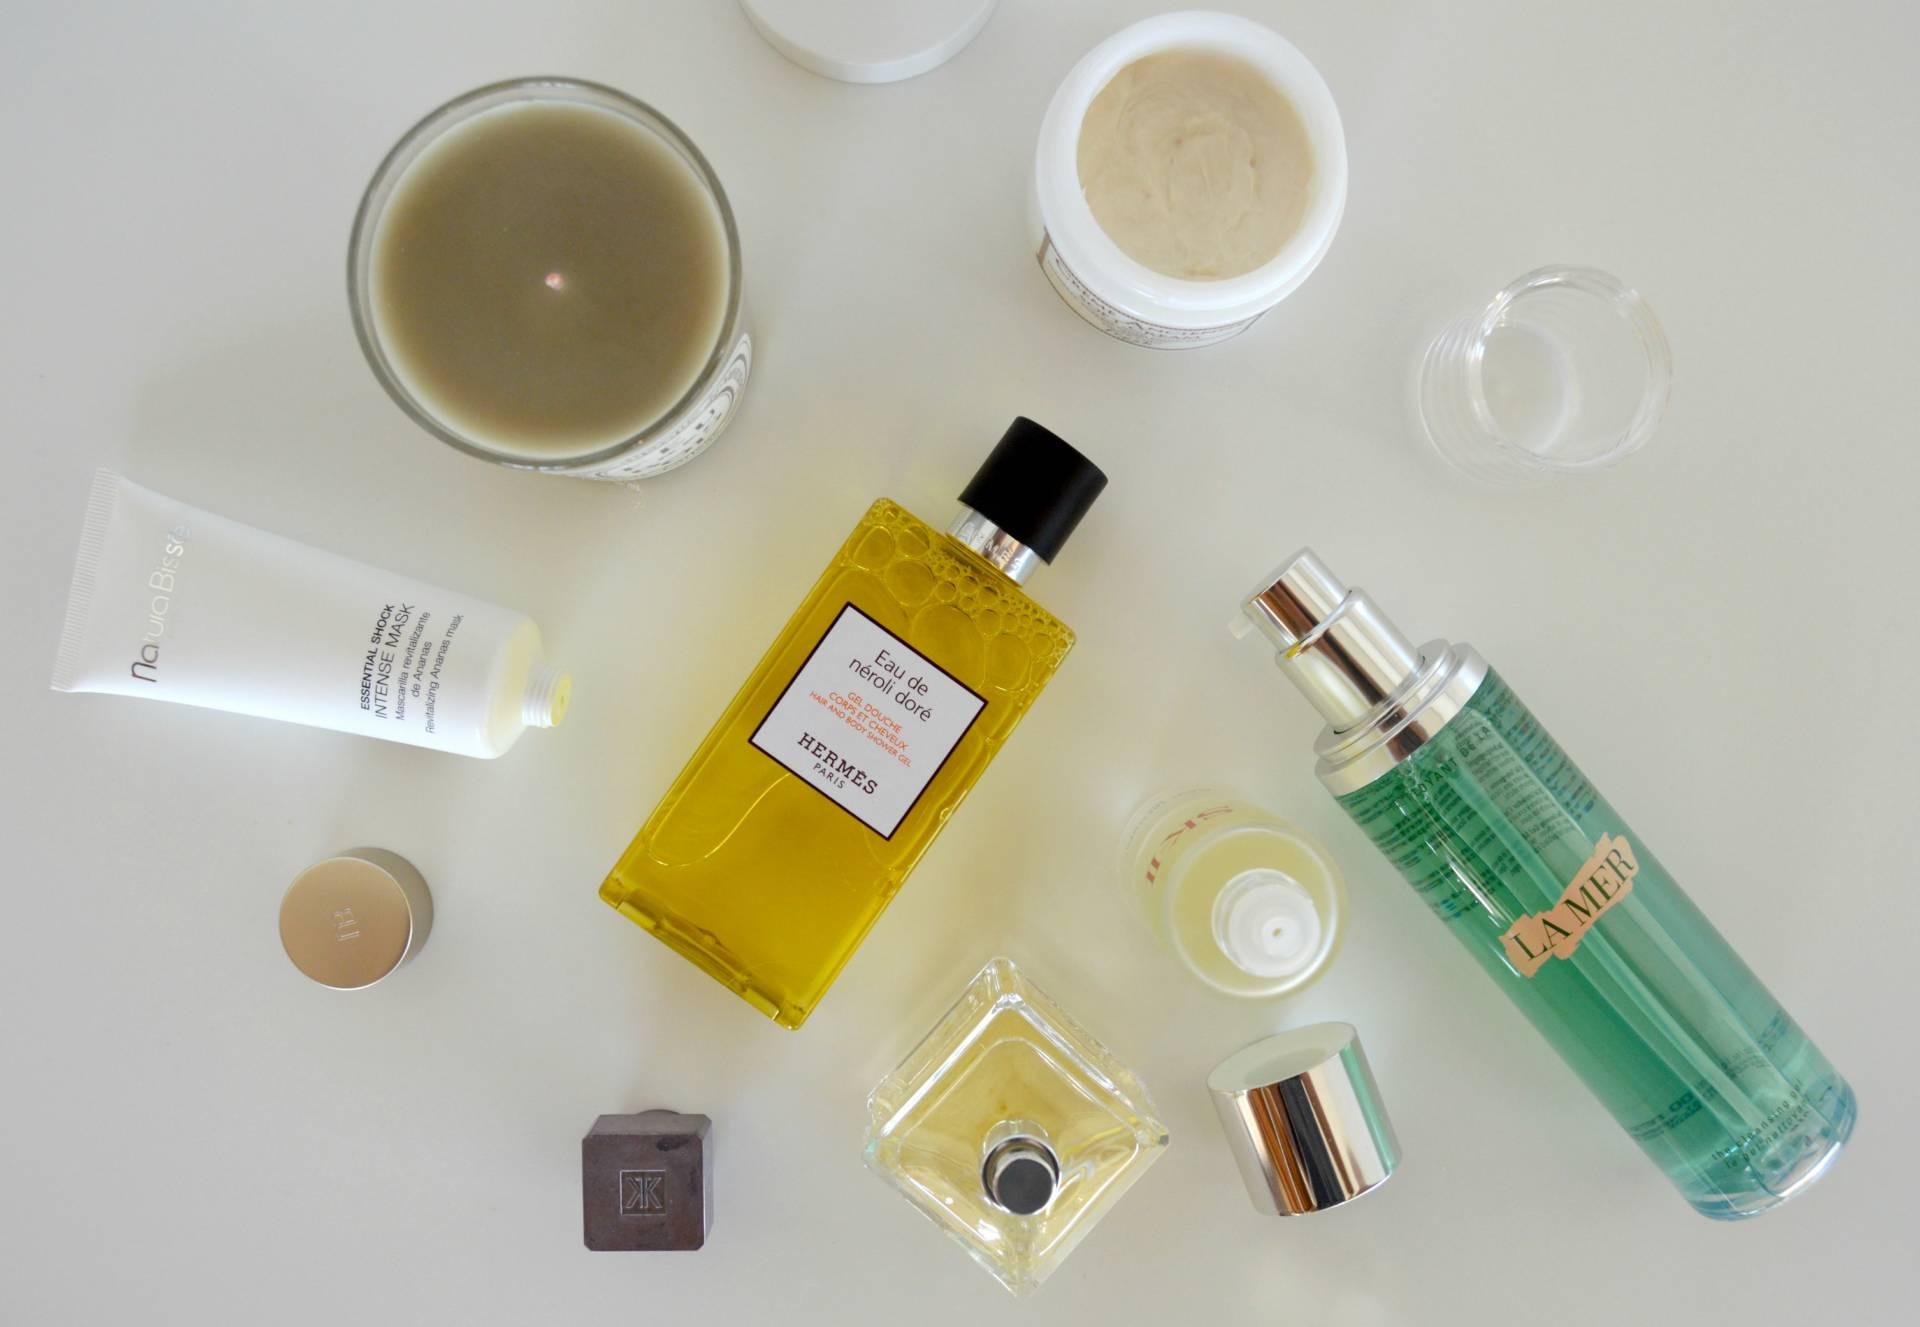 neiman-marcus-luxury-skincare-grooming-inhautepursuit-edit